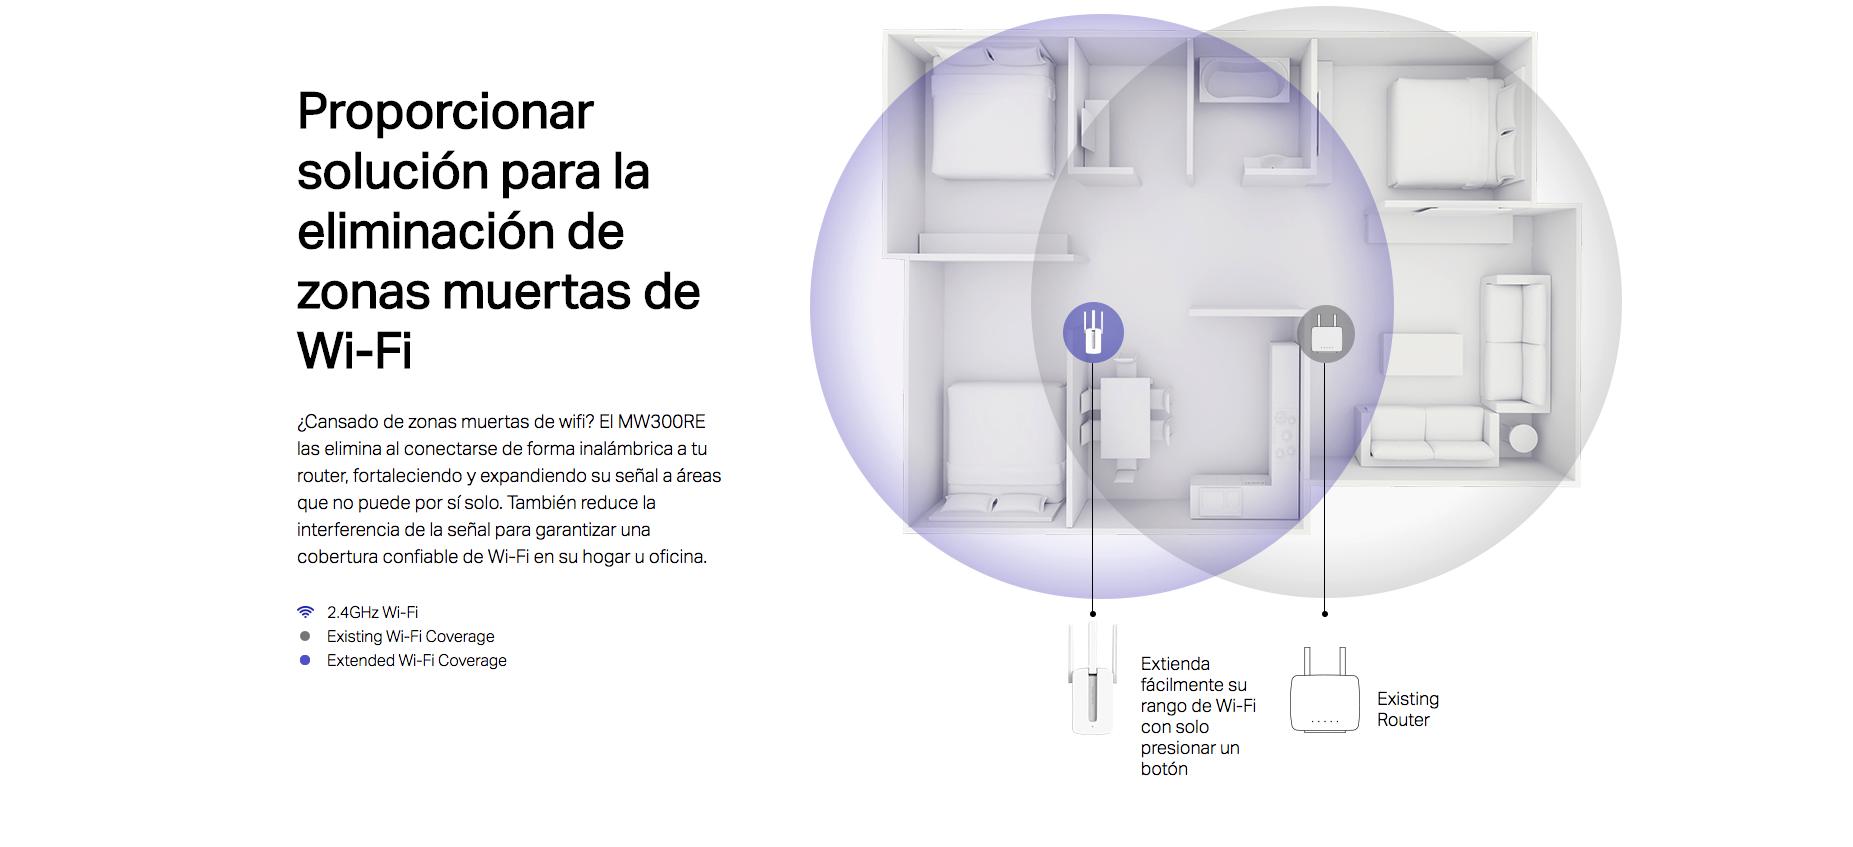 Globaltecnoly Captura%20de%20pantalla%202019 10 07%20a%20la%28s%29%2014.03.06